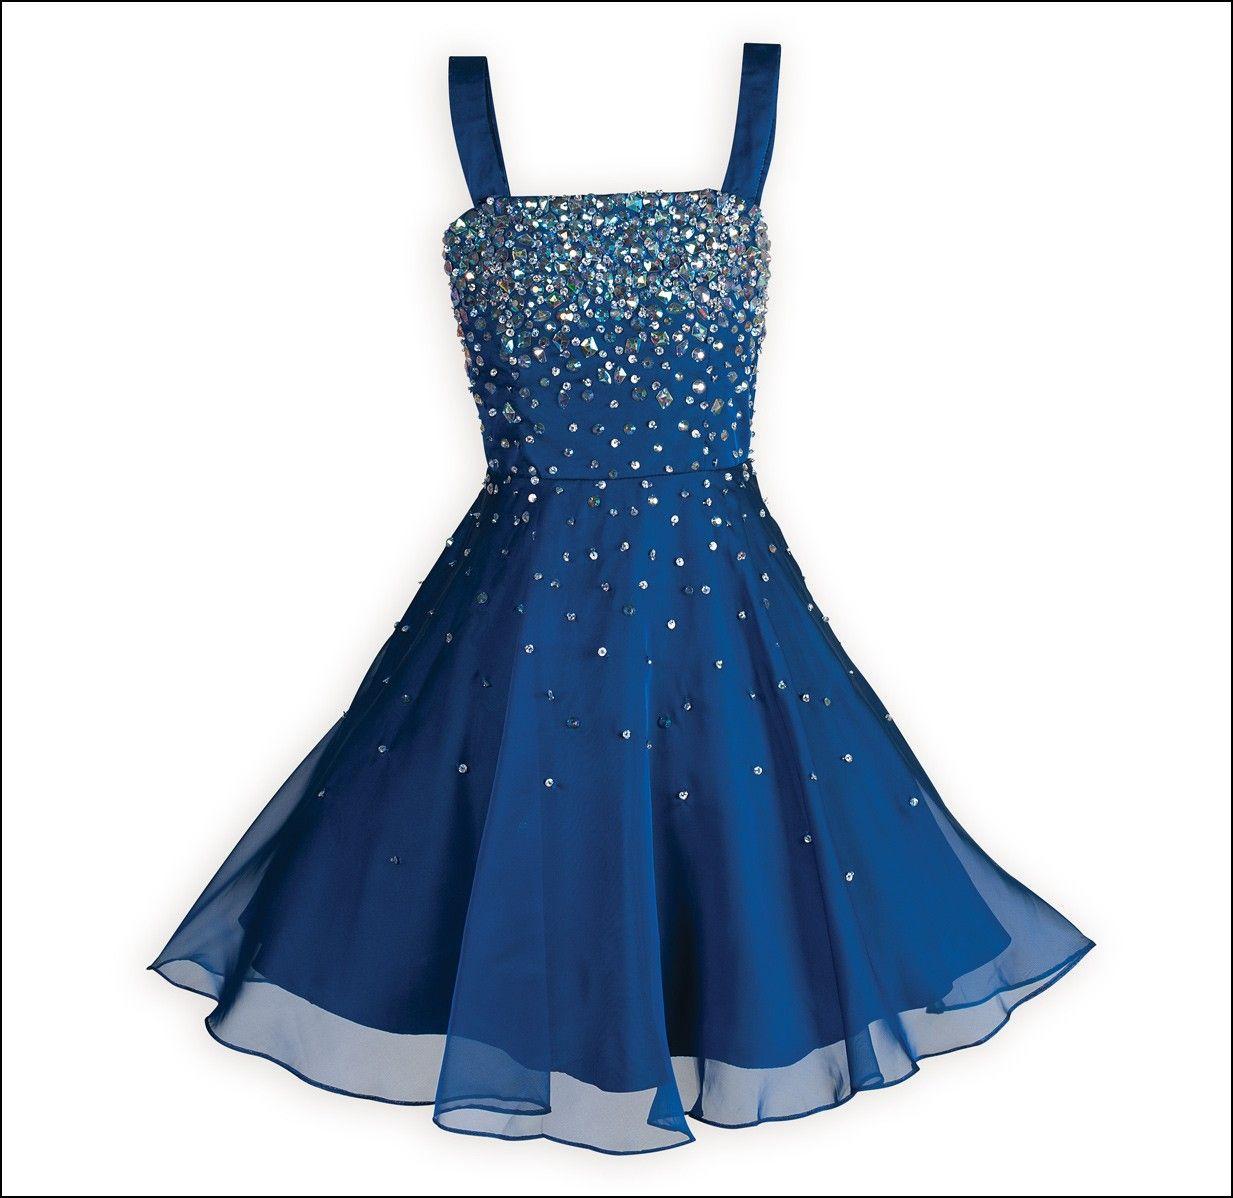 Fashion week Dresses girls 7-16 blue for woman